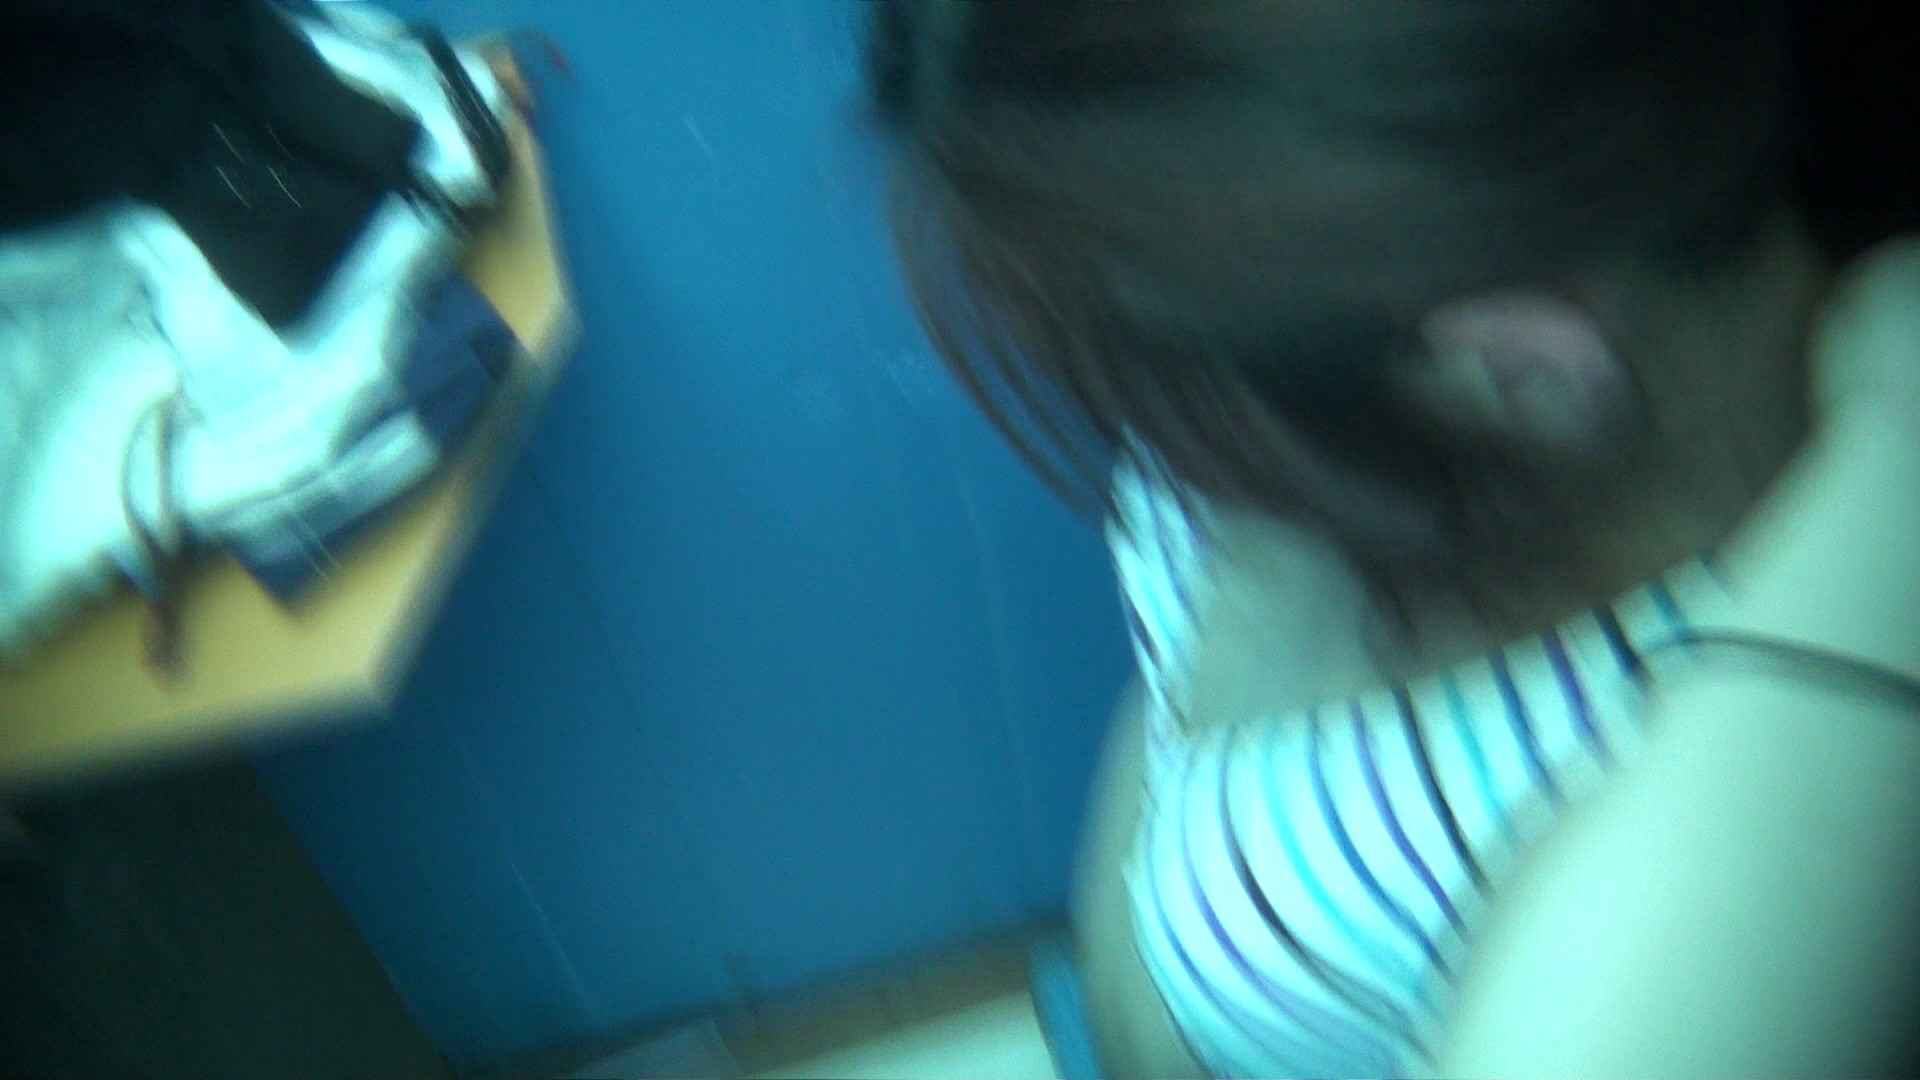 Vol.27 乳首は一瞬貧乳女市さん 盗撮 セックス画像 68pic 27